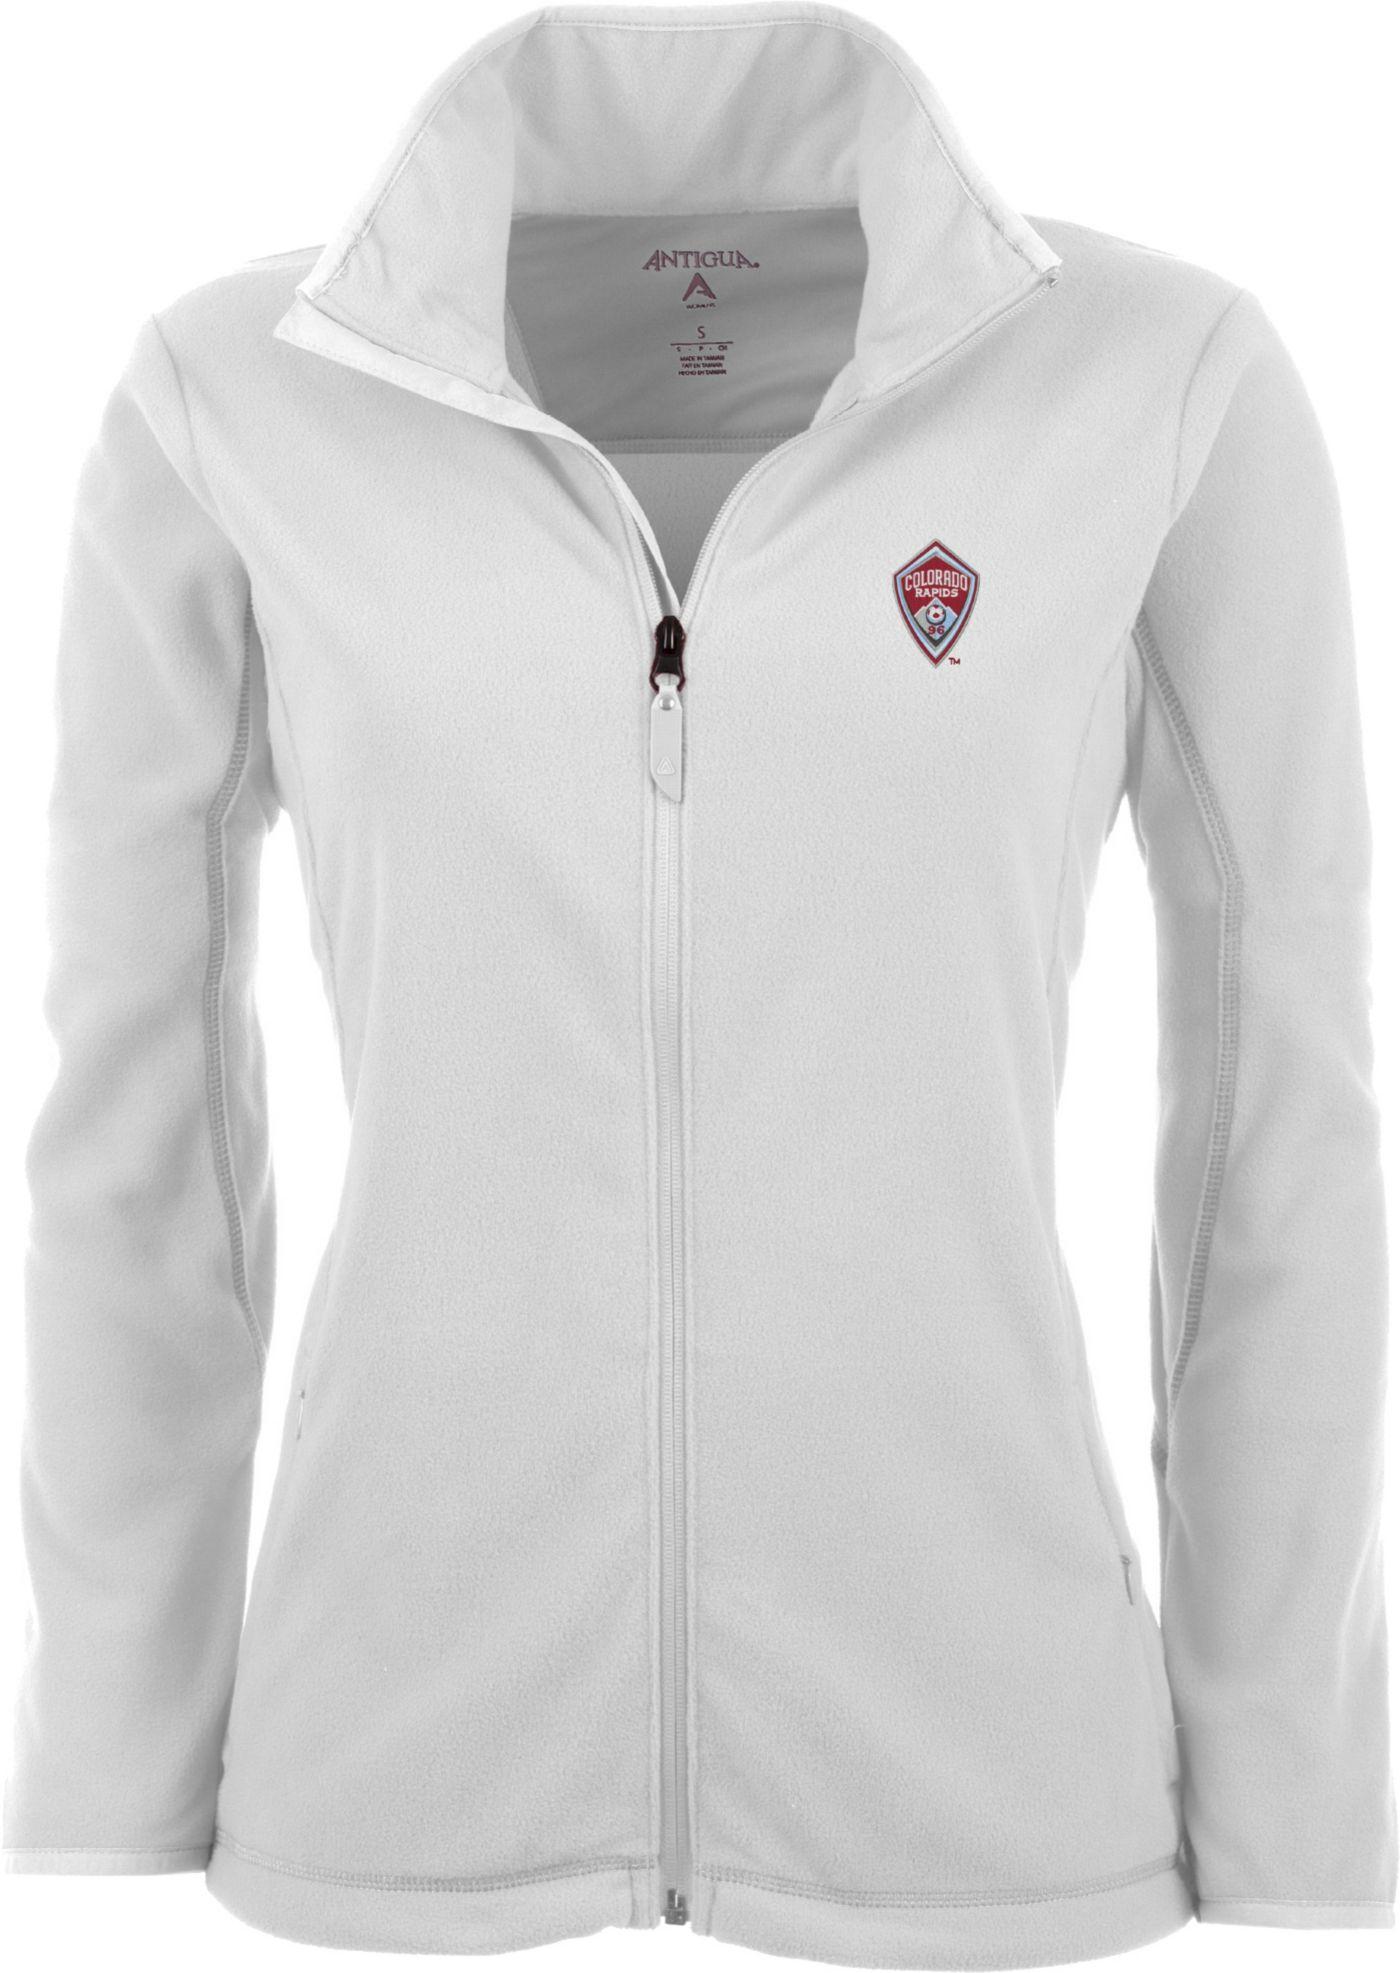 Antigua Women's Colorado Rapids White Ice Full-Zip Fleece Jacket